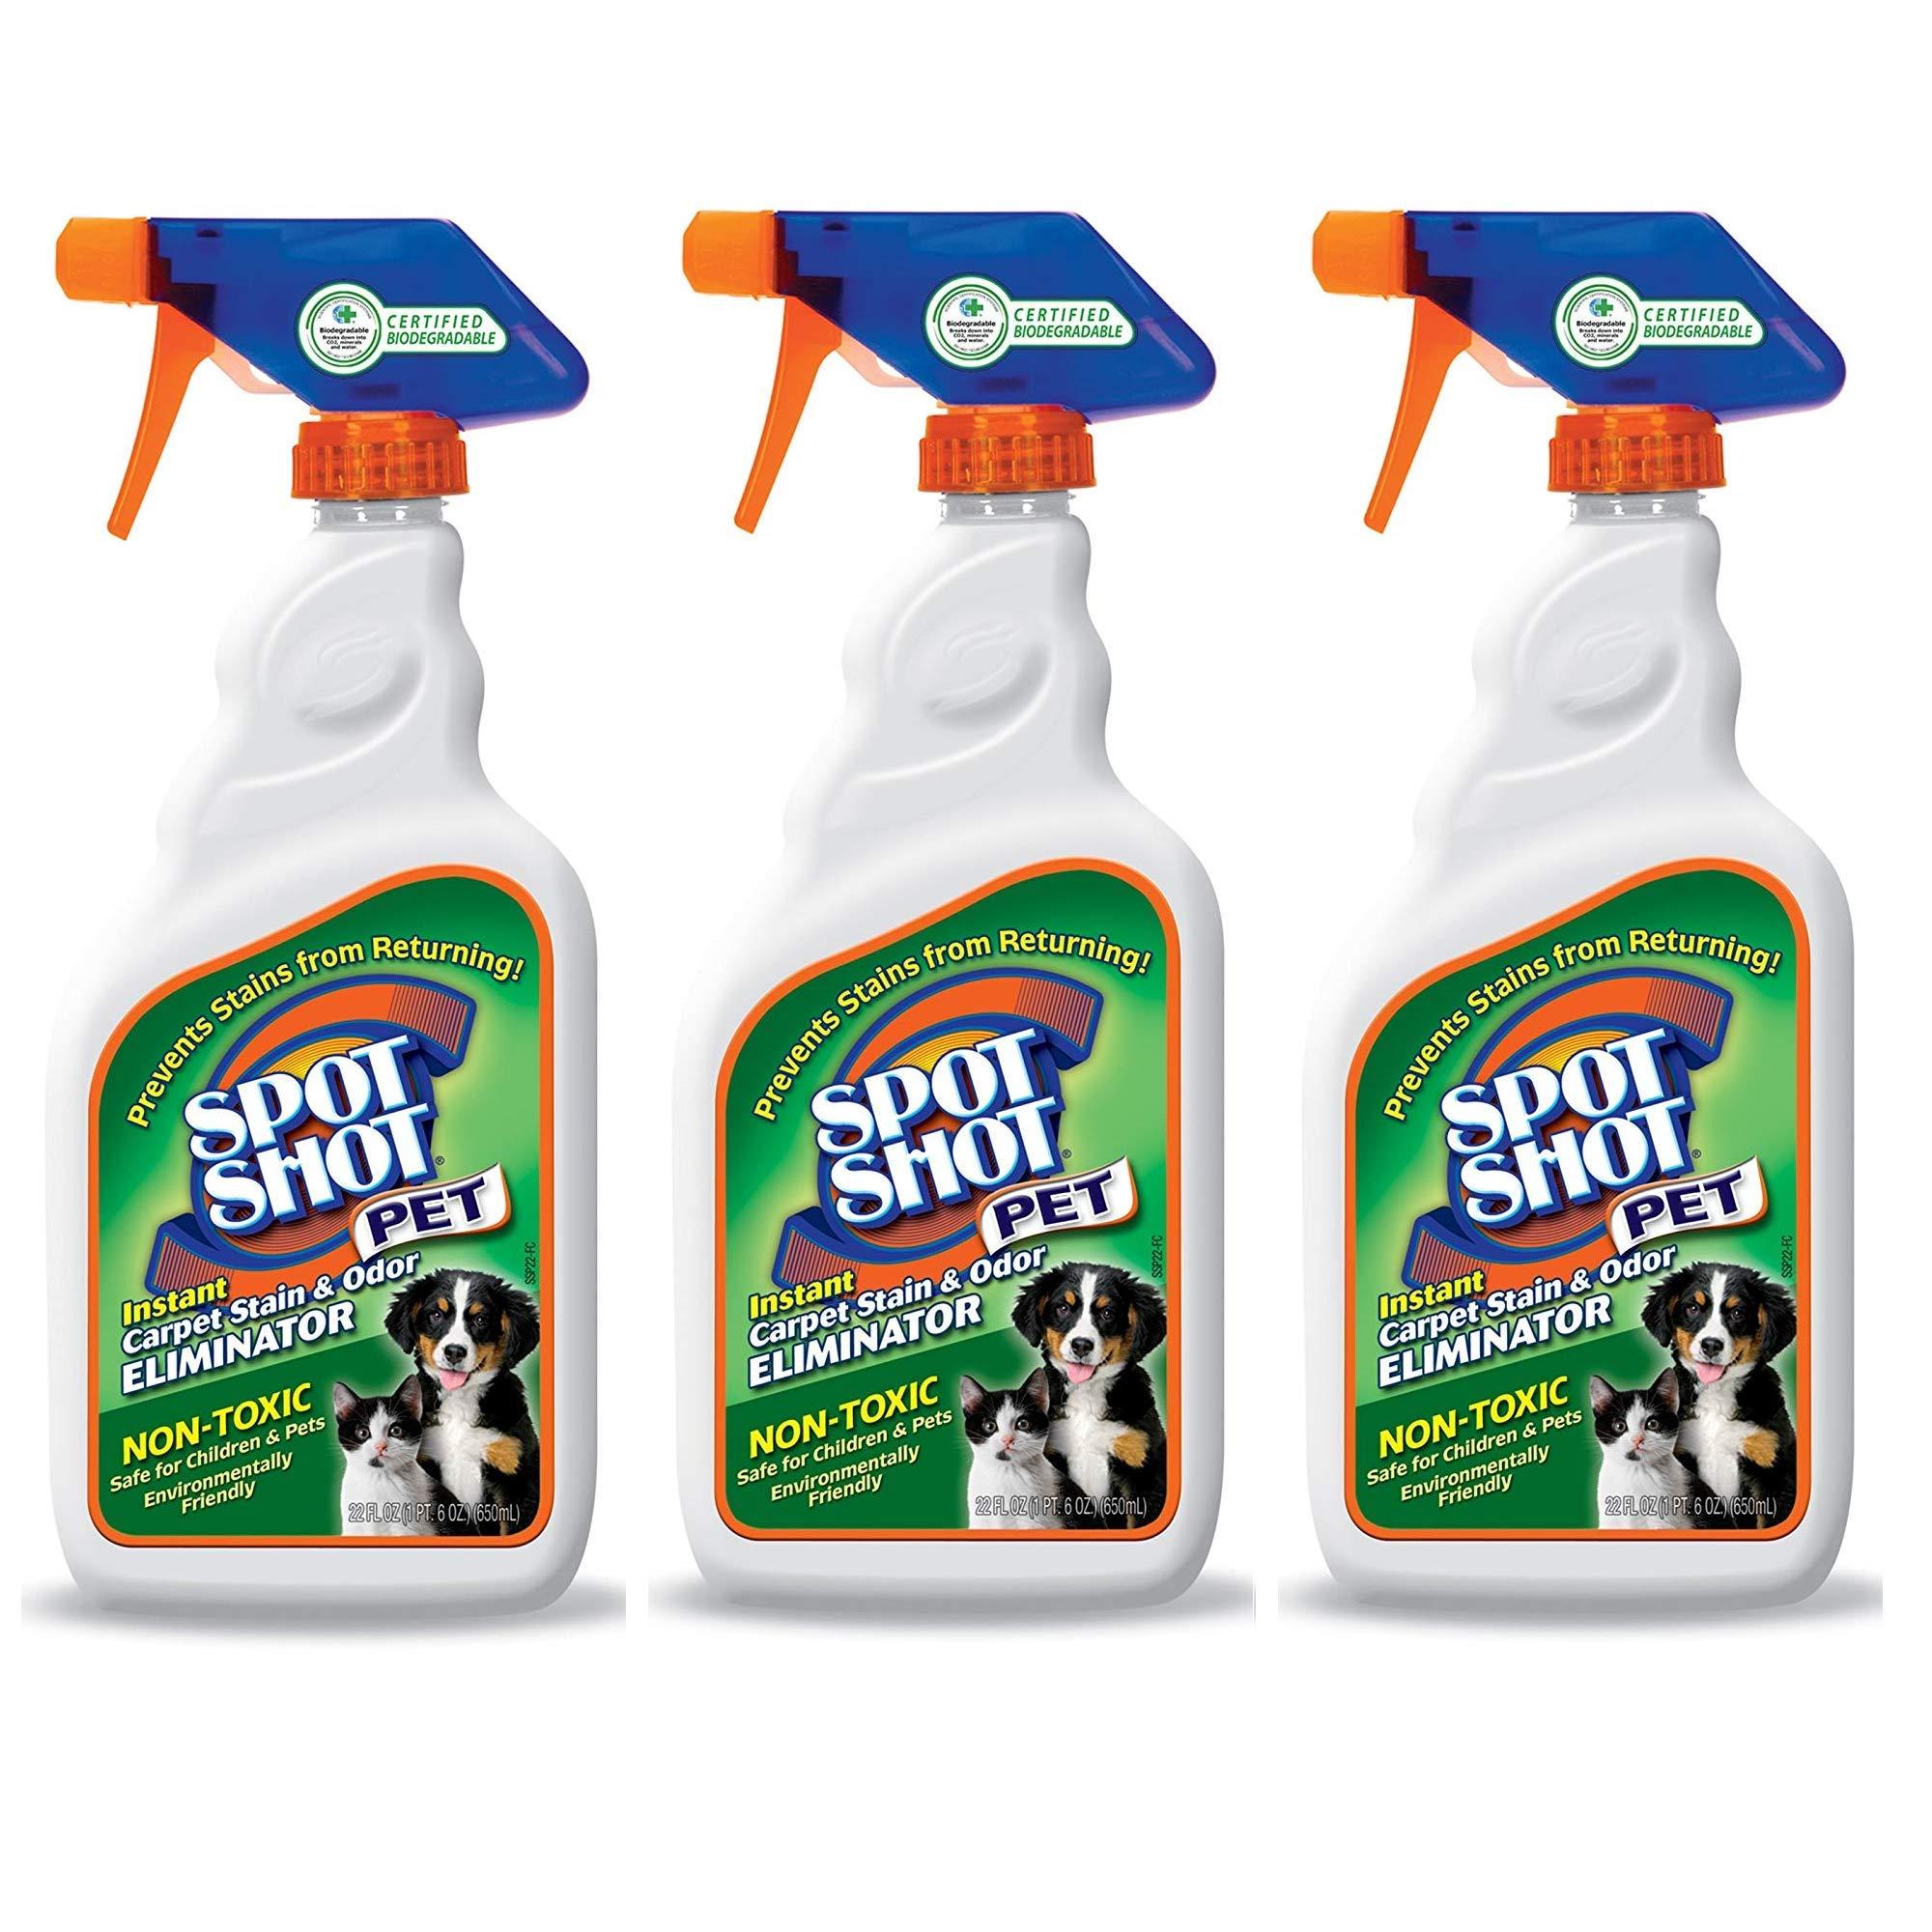 Spot Shot 099126 Instant Carpet Pet Stain & Odor Eliminator, 22 oz. - 3 Pack